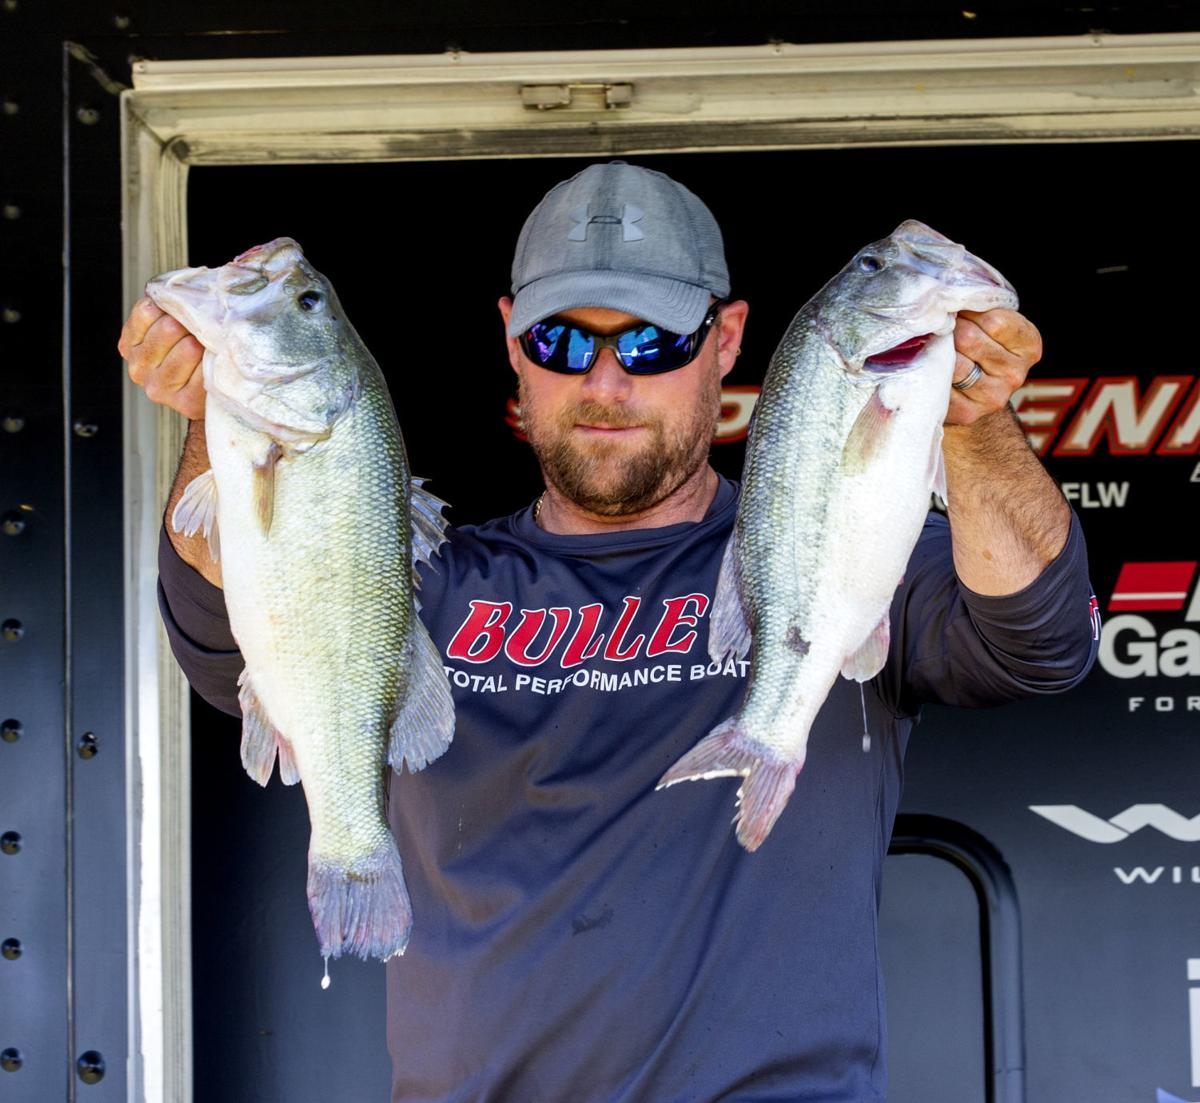 200530 FLW fishing series 1